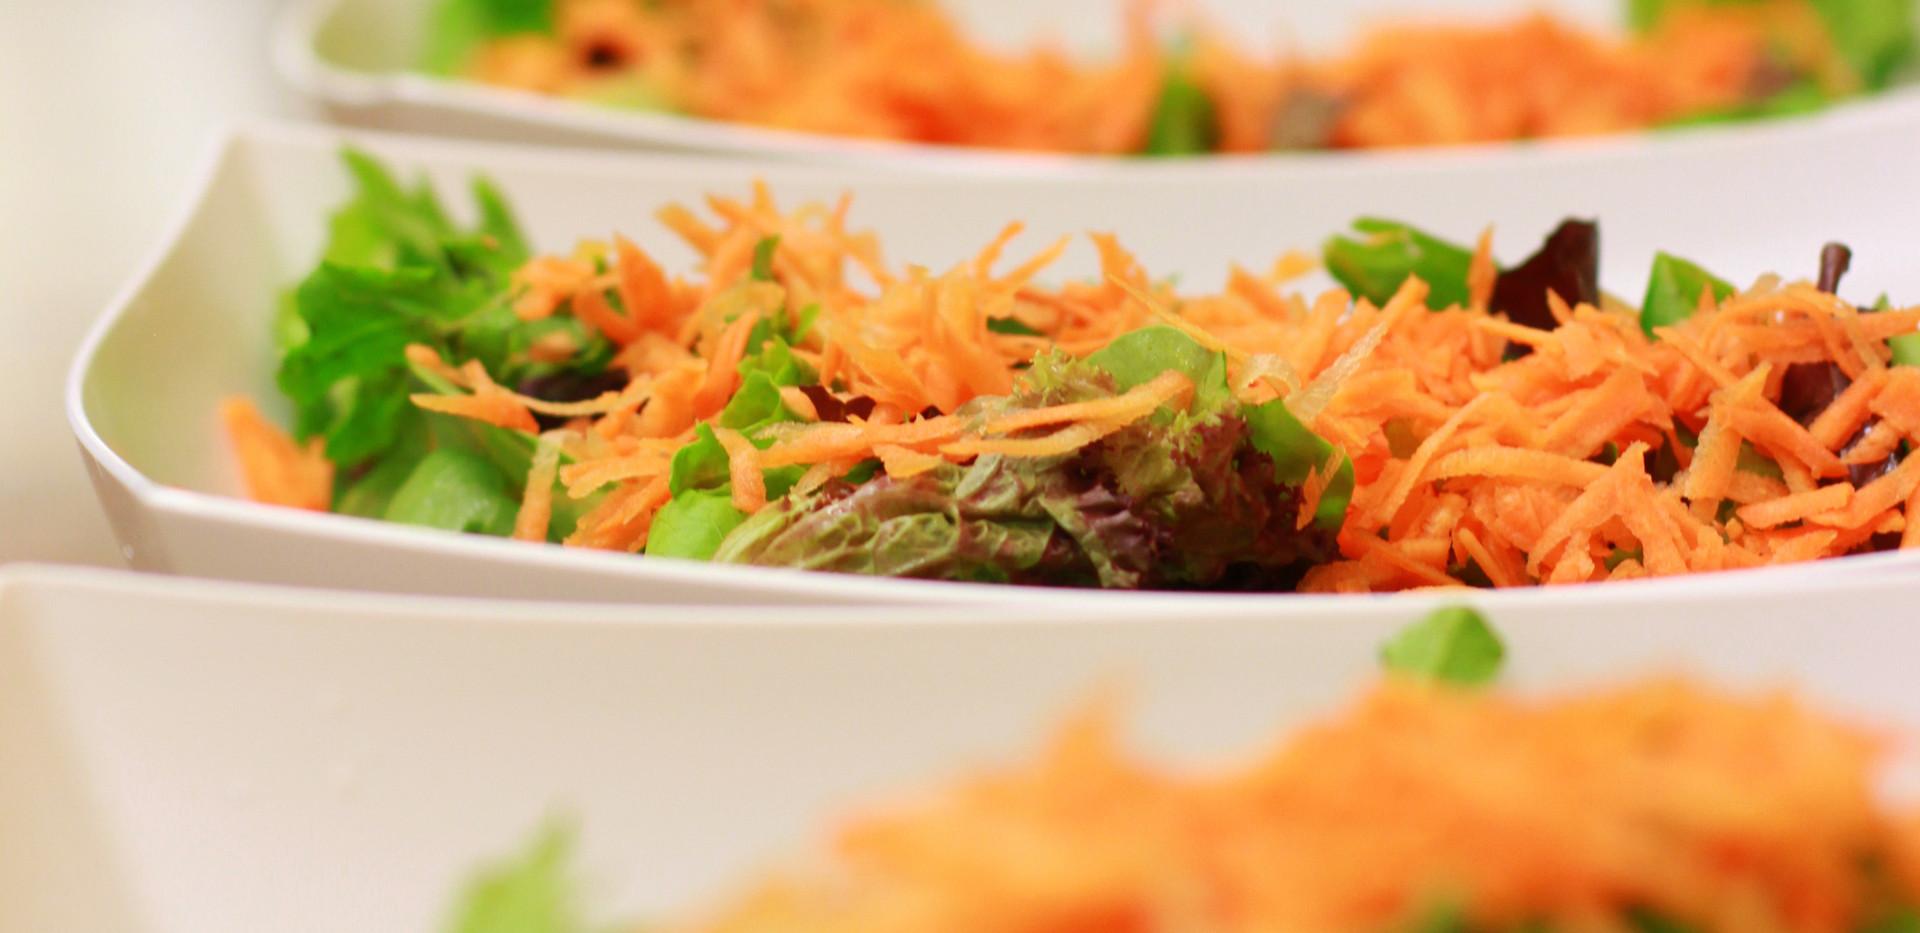 Salade carottes 2.JPG